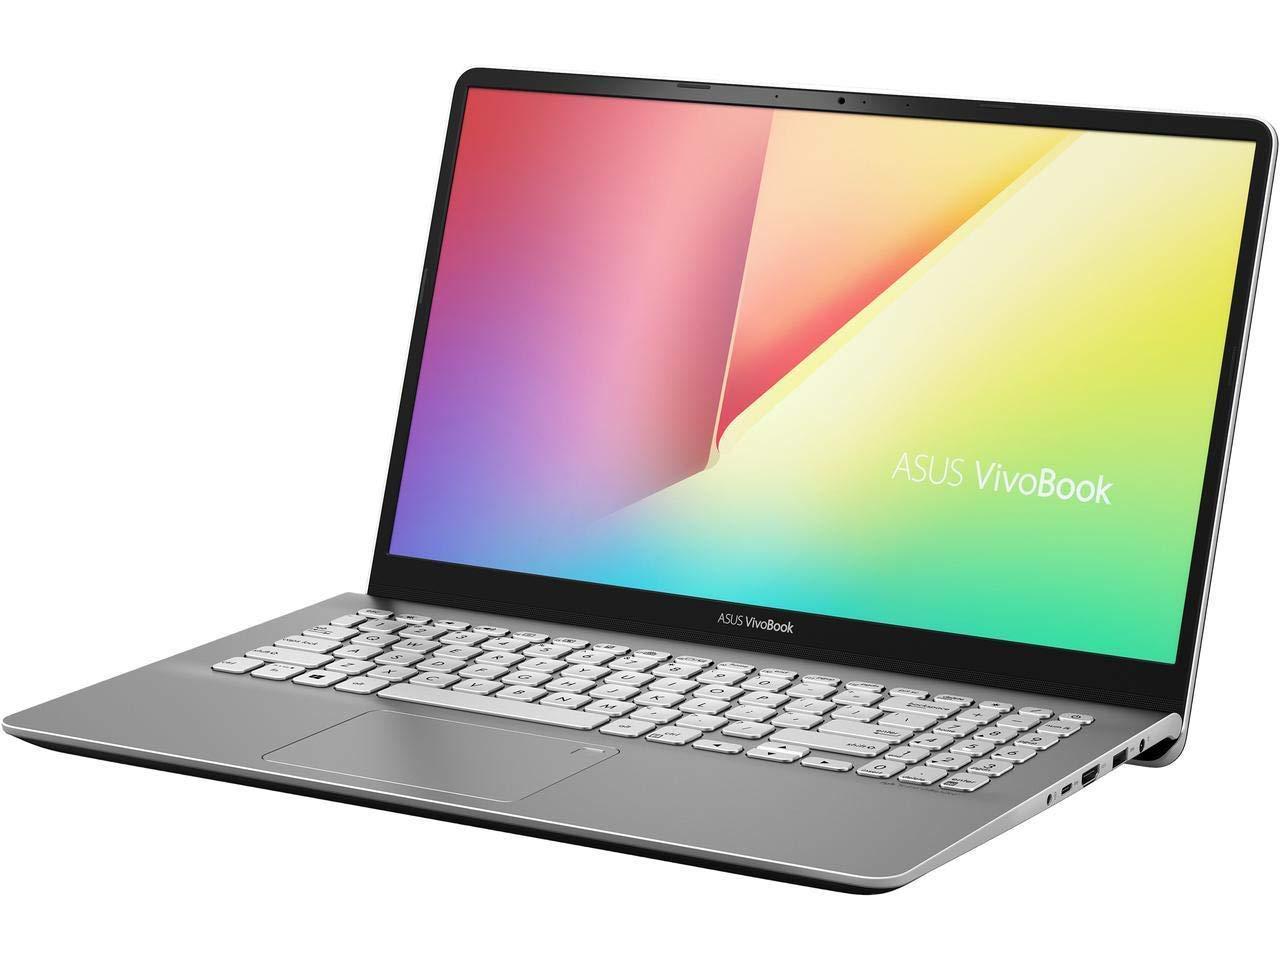 ASUS S530FN 15.6 Inch FHD Thin and Portable Laptop, Intel Core i7-8565U, NVIDIA GeForce MX150, 8GB DDR4 RAM, 256GB SSD 1TB HDD Hybrid, Backlit Keyboard, Narrow Bezel Design, Win 10